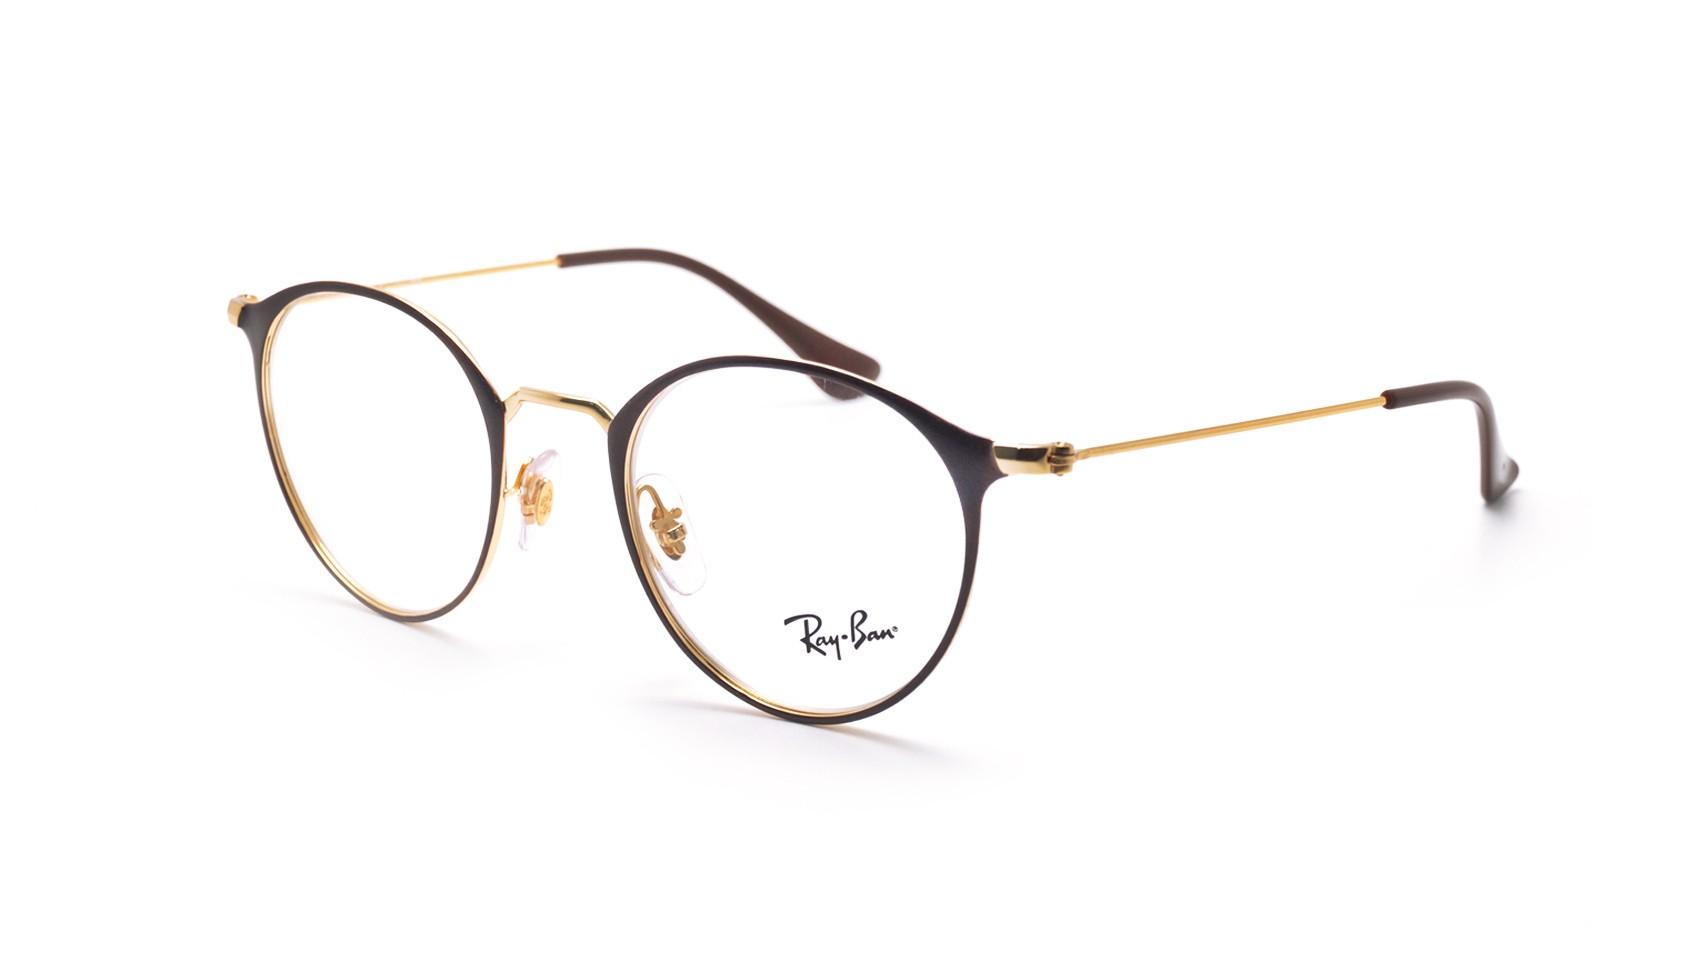 d19e2c8f69f Eyeglasses Ray-Ban RX6378 RB6378 2905 47-21 Brown Small